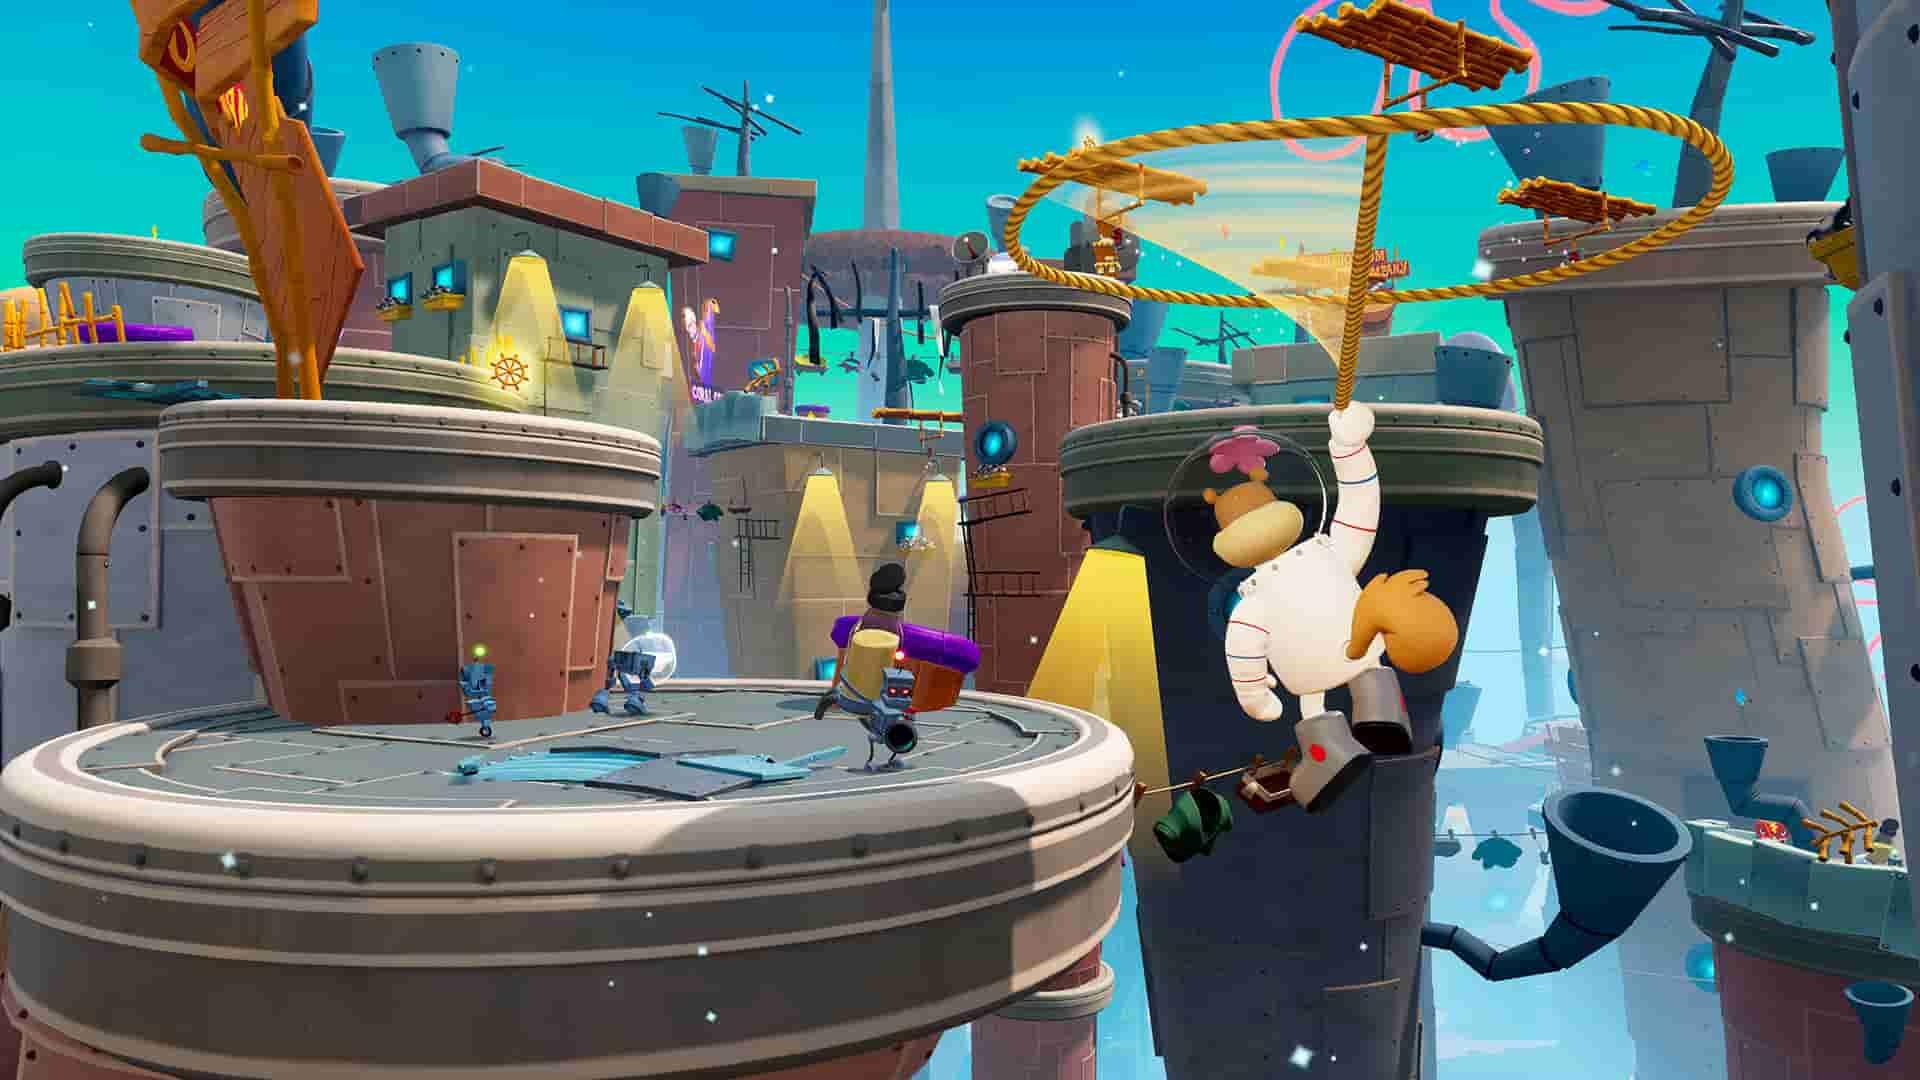 SpongeBob SquarePants: Battle for Bikini Bottom - Rehydrated Review 02